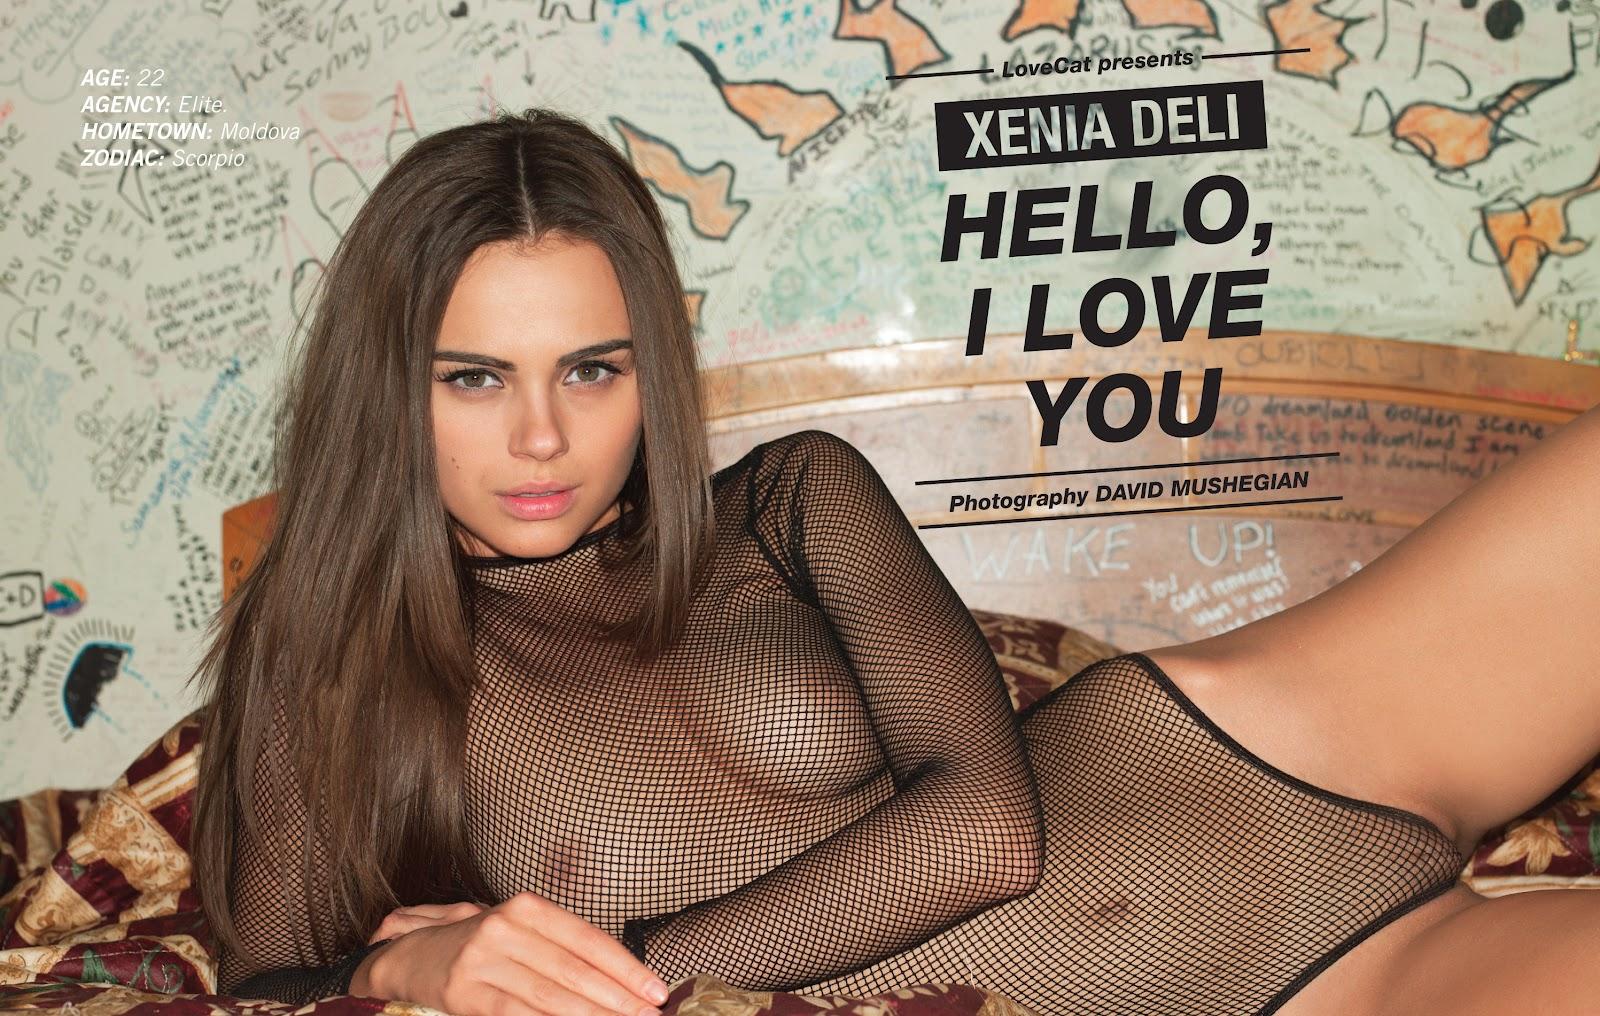 braless Sex Xenia Deli naked photo 2017